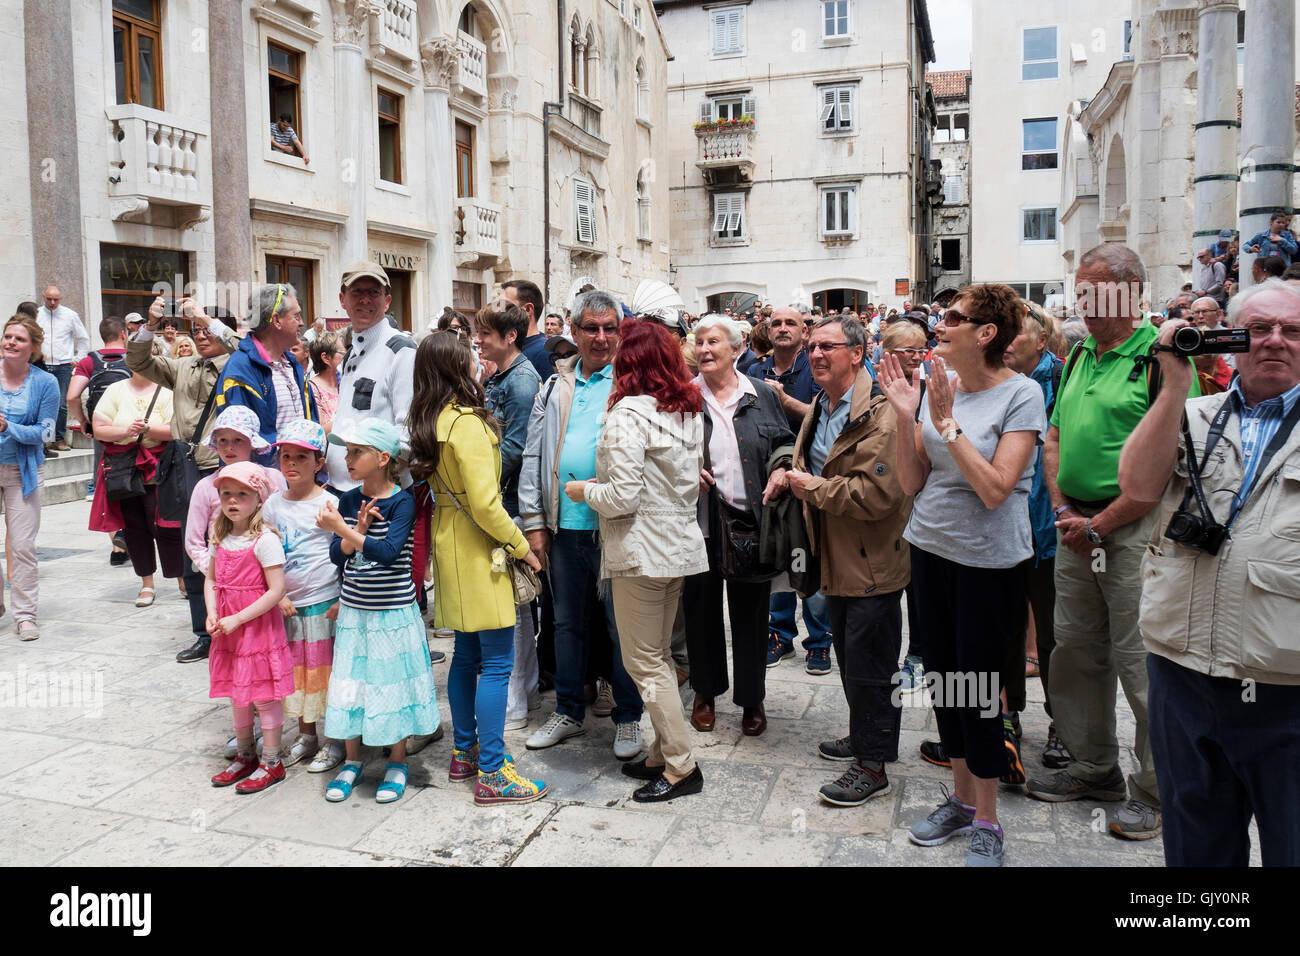 Crowd watching Roman Enactment, Split, Croatia, Dalmatian Coast, Diocletian's Palace - Stock Image